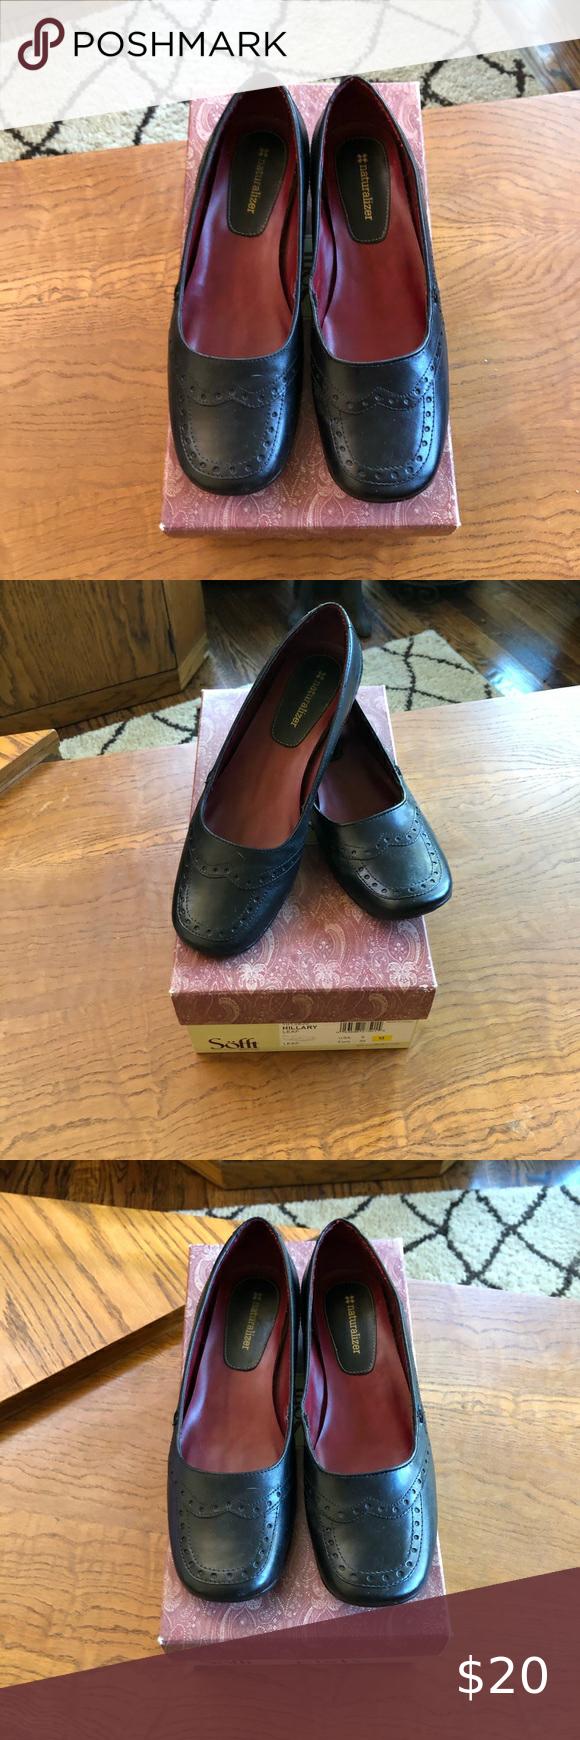 Genuine Leather Sandals/White Sole Shoes/Extravagant Cut